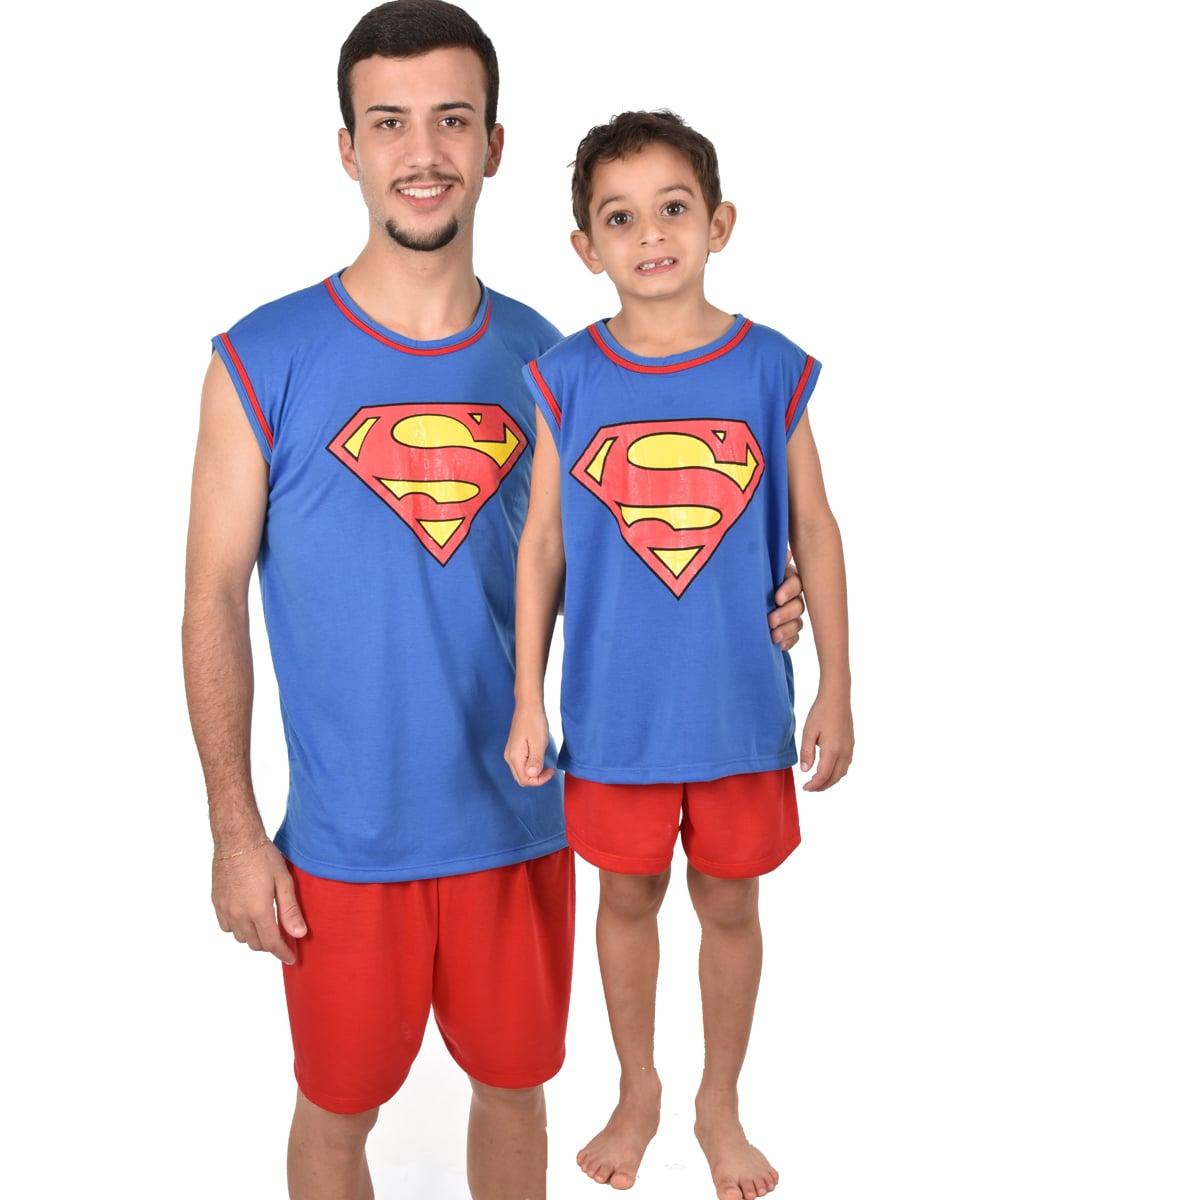 Pijama Regata Short Masculino Infantil Menino Super Homem Superman Liga da Justiça Ref 356